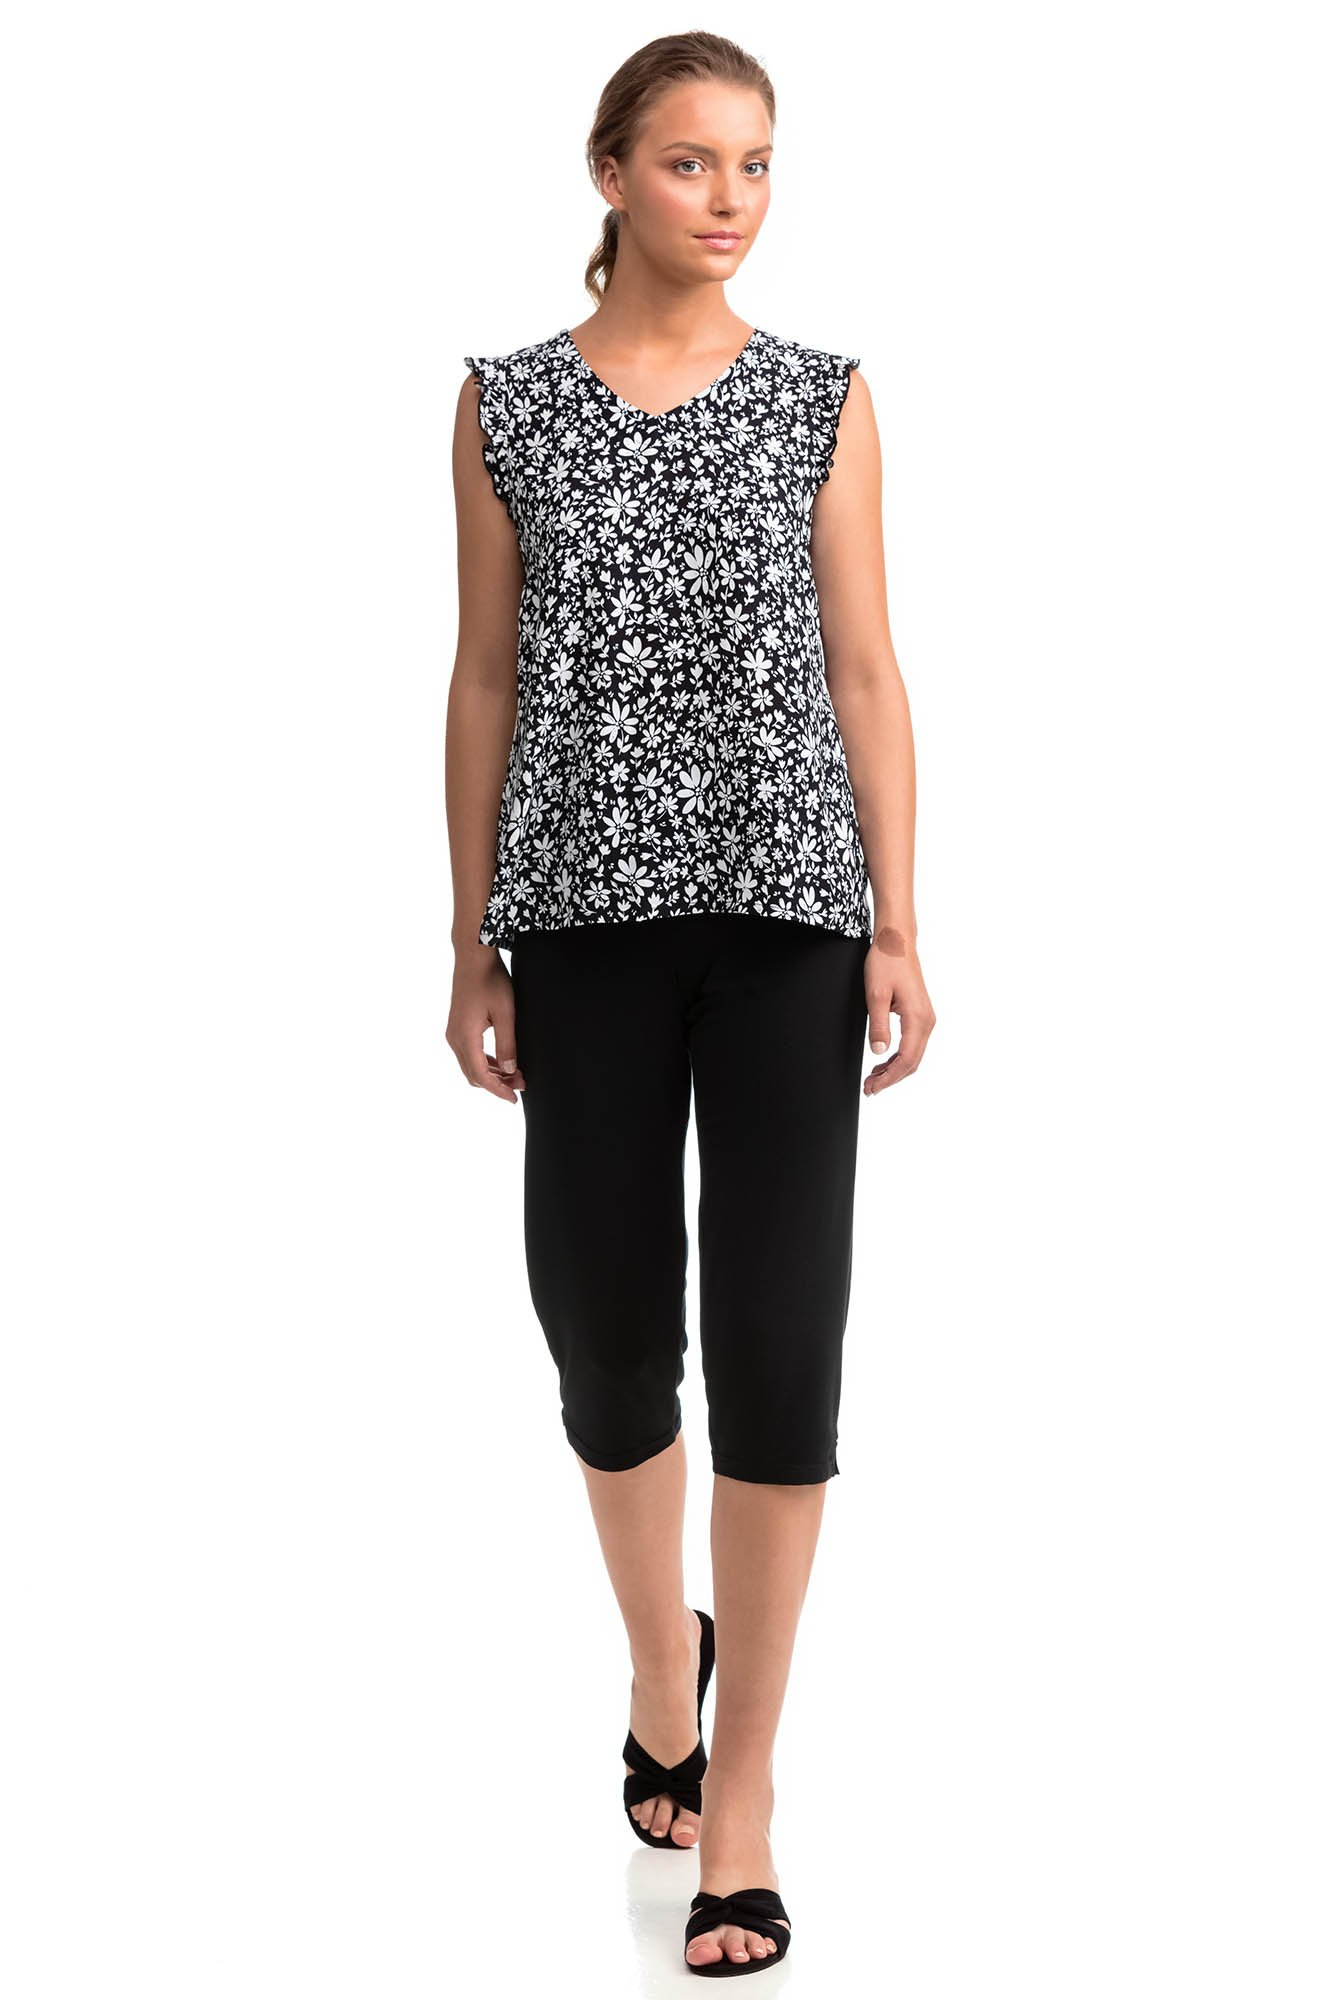 Vamp - Dámske pyžamo 14056 - Vamp black l